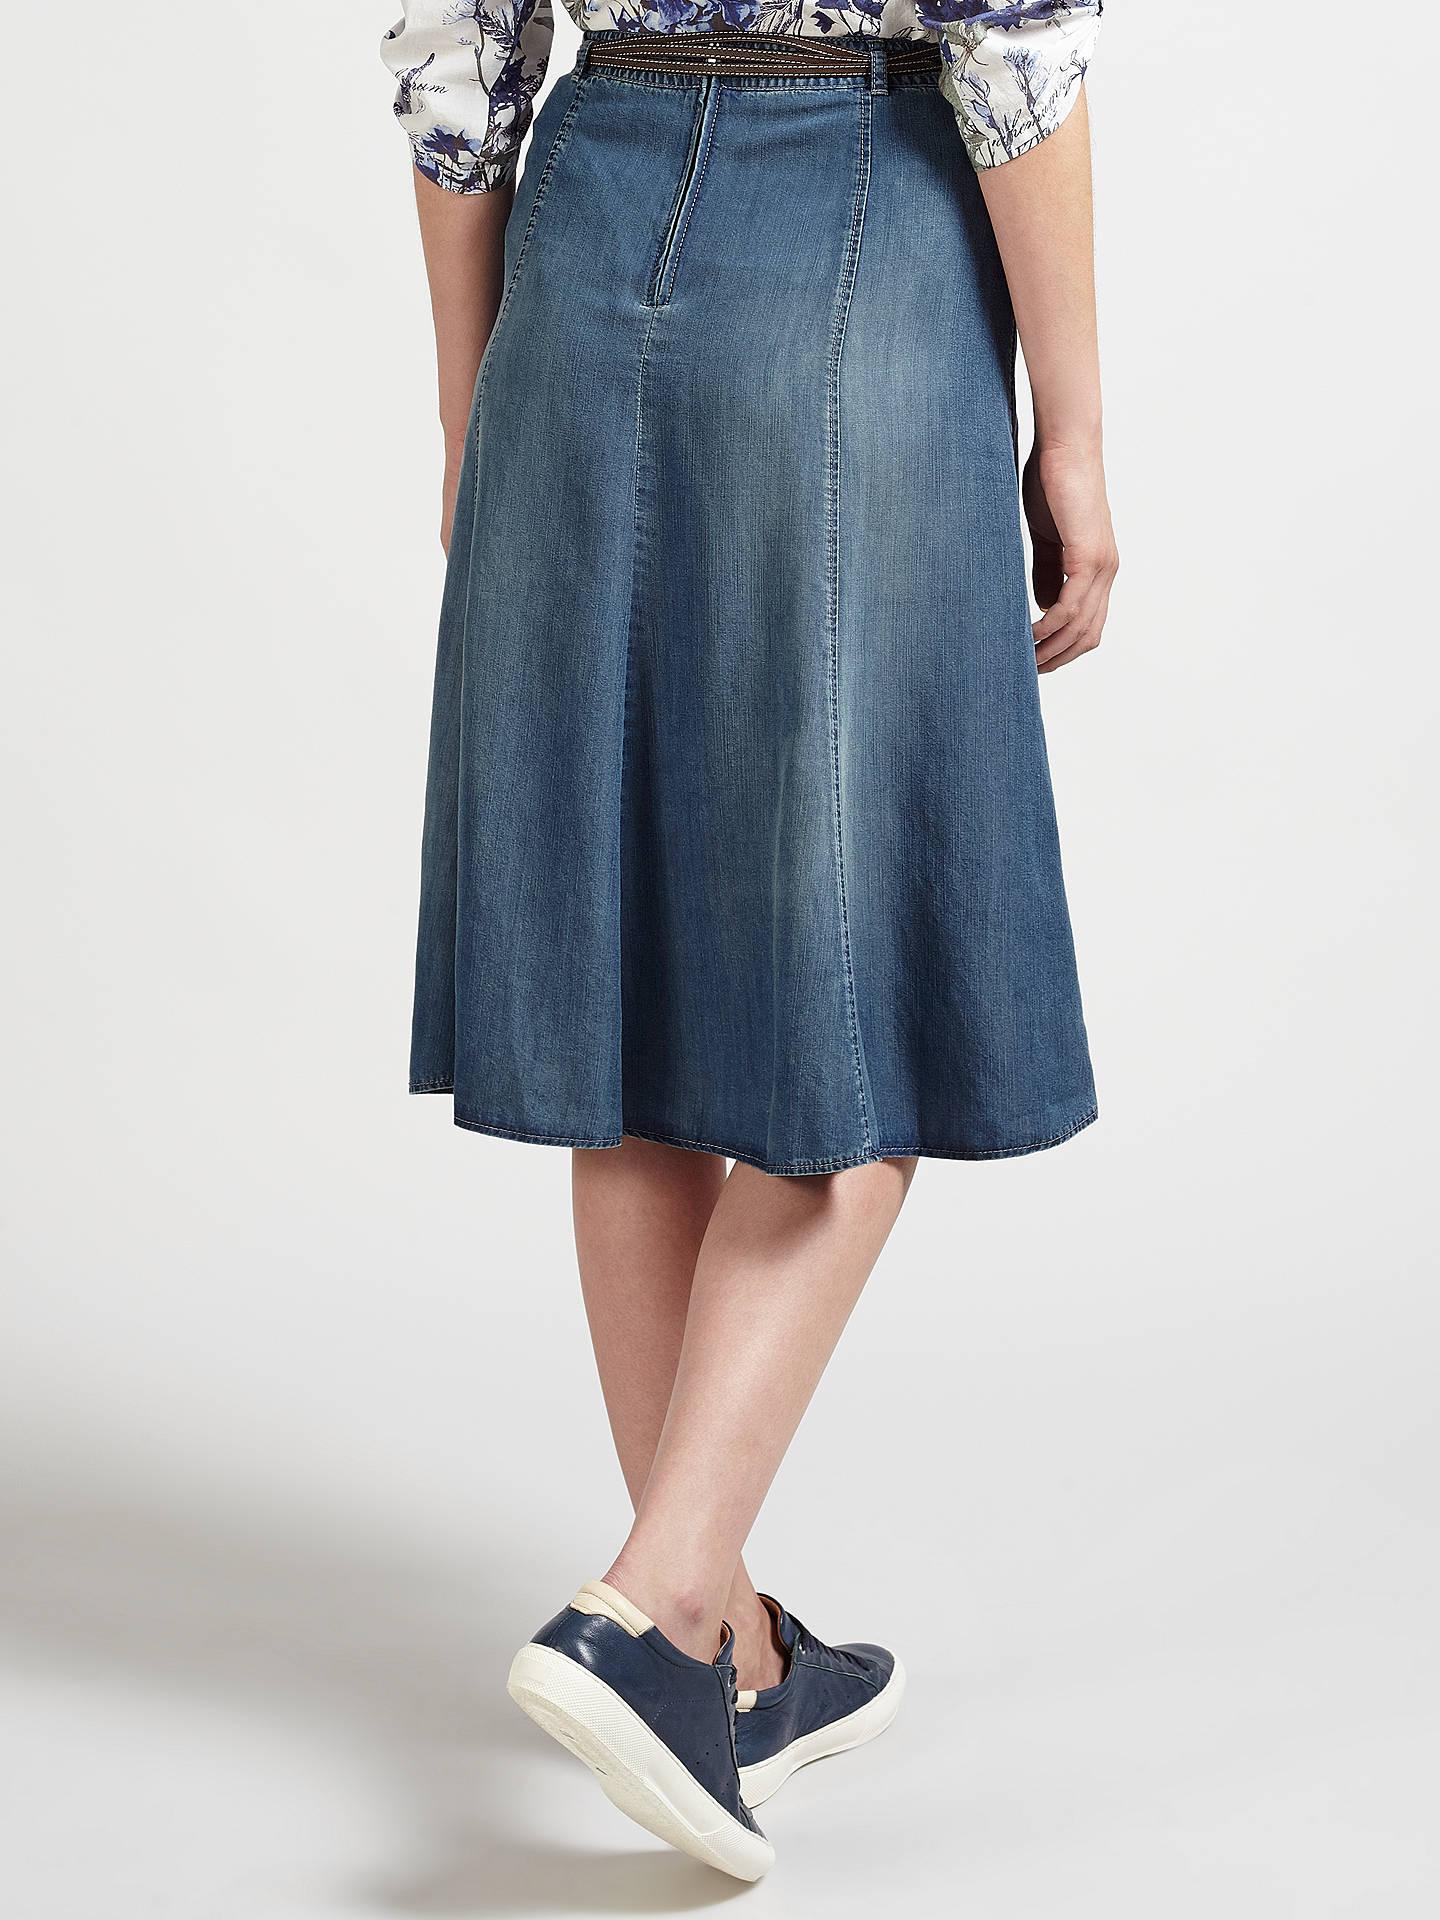 5ebf775b5e ... Buy Gerry Weber Denim Skirt, Blue, 10 Online at johnlewis.com ...